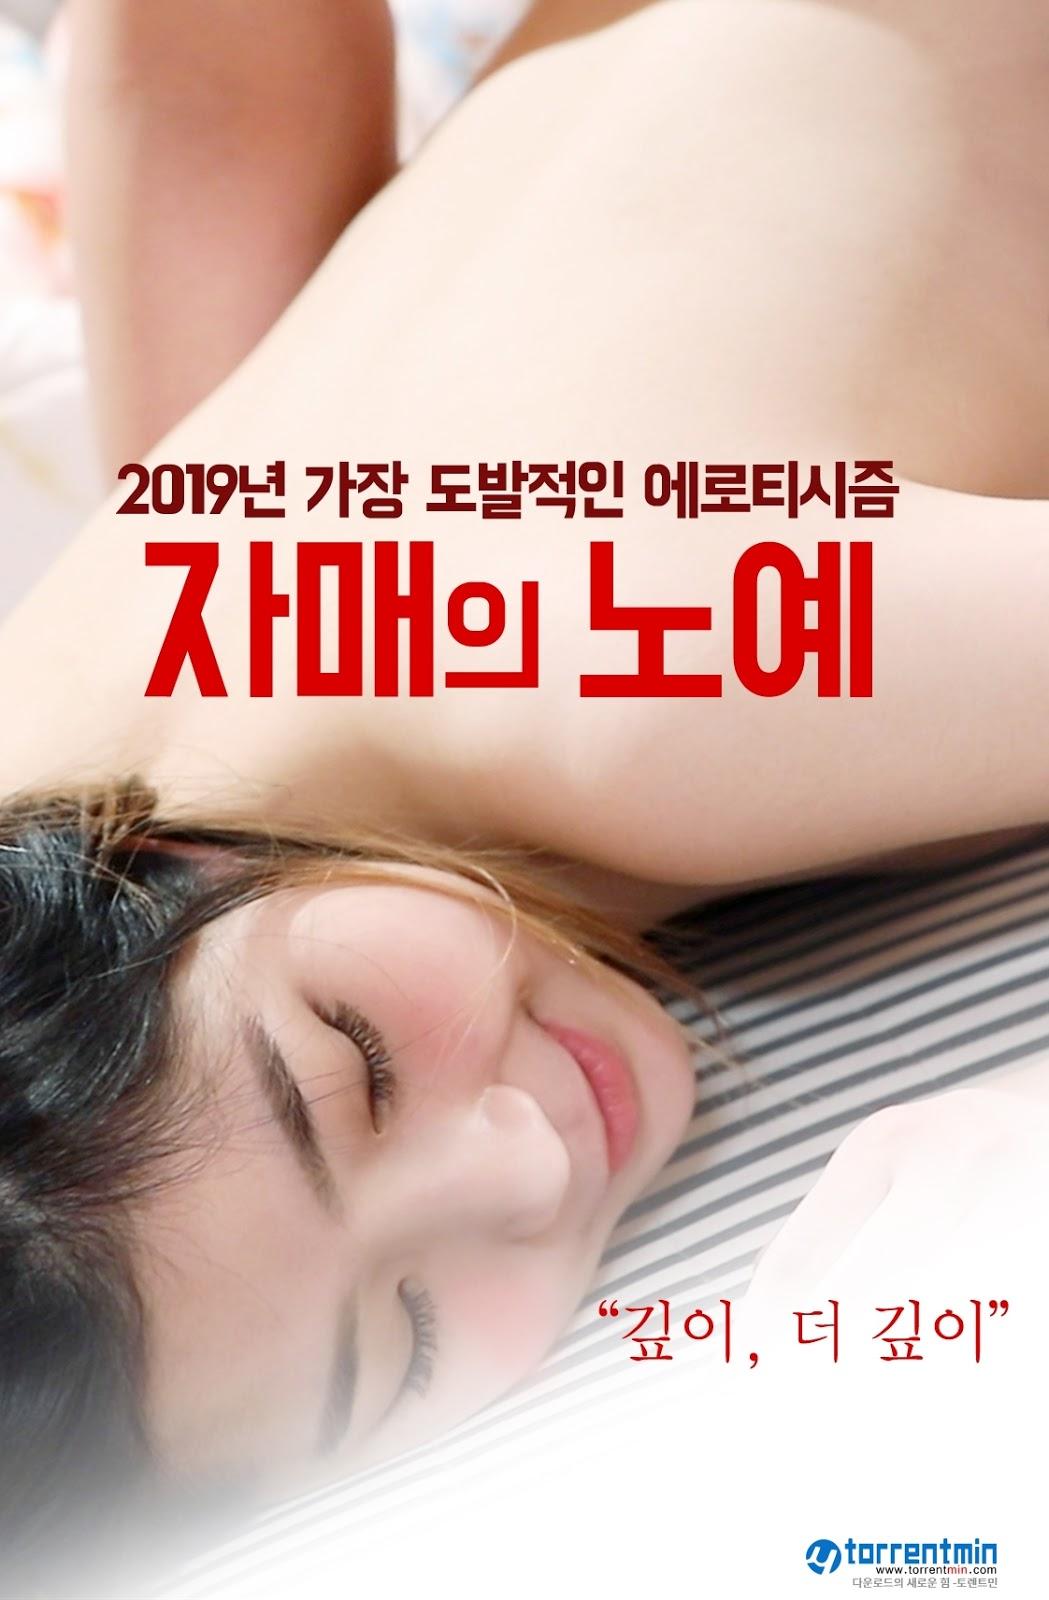 Sister Slave 2019 Full Korea 18+ Adult Movie Online Free